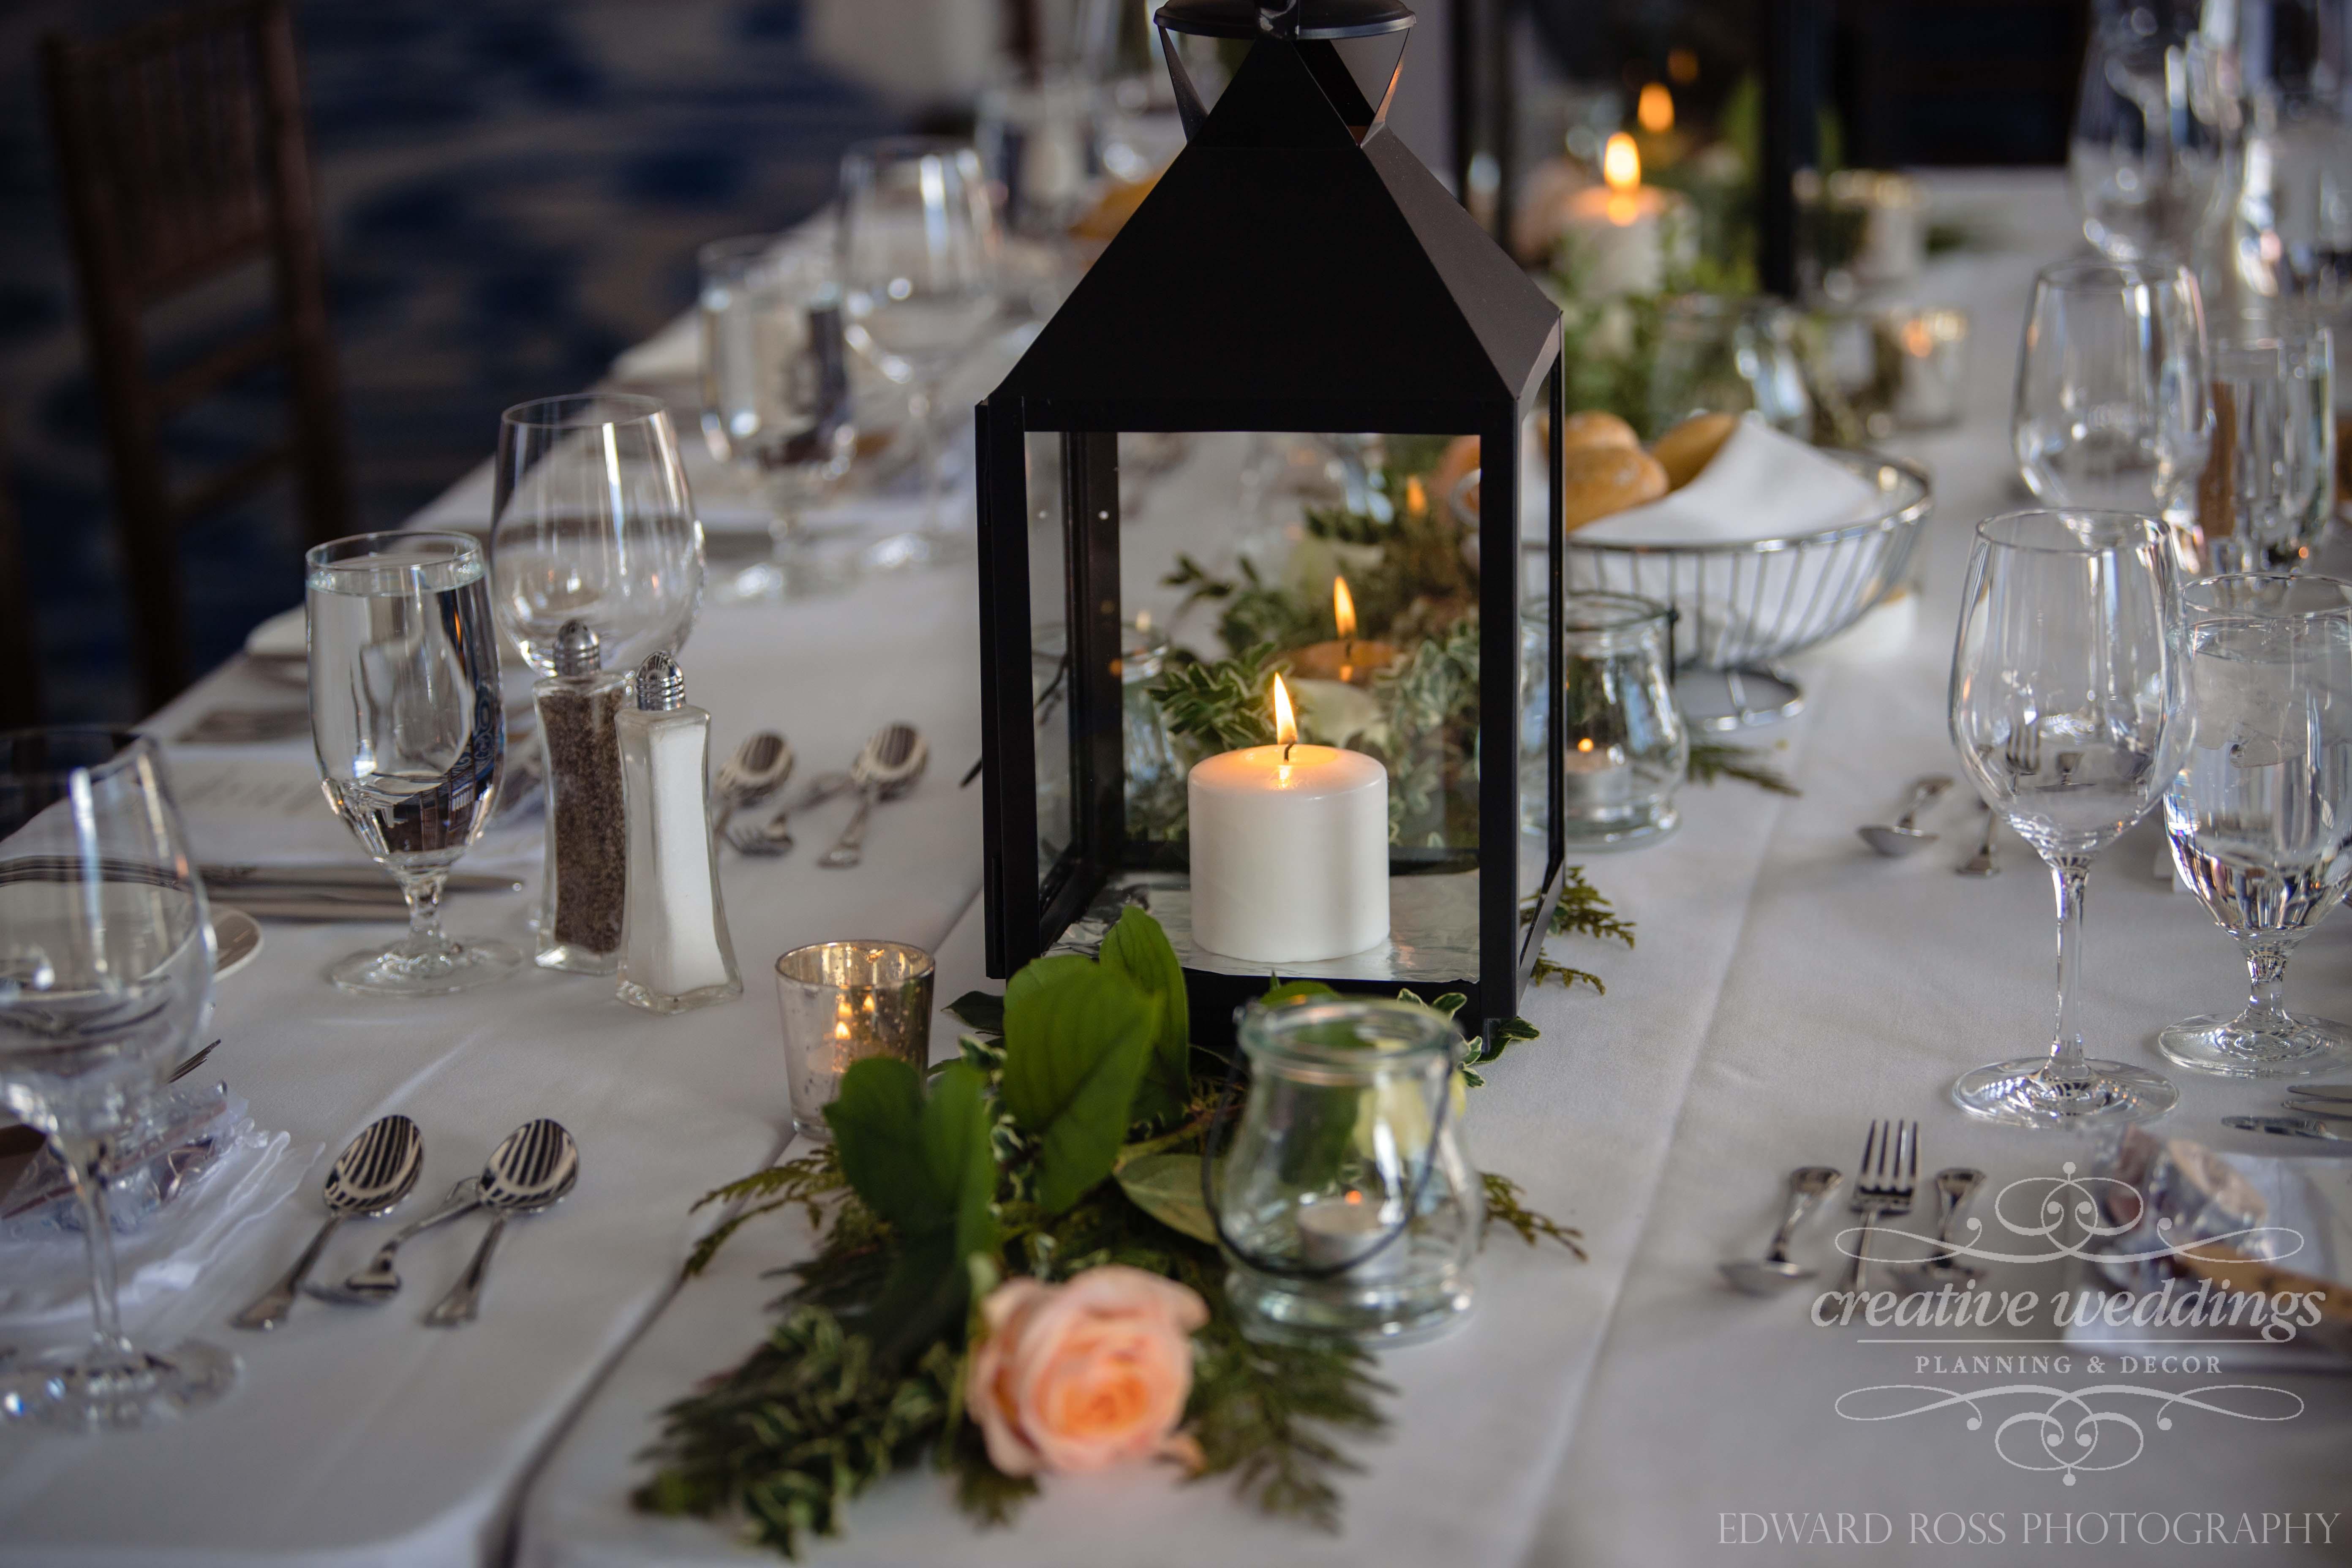 Creative Wedding Table Centerpiece Ideas - mypic.asia